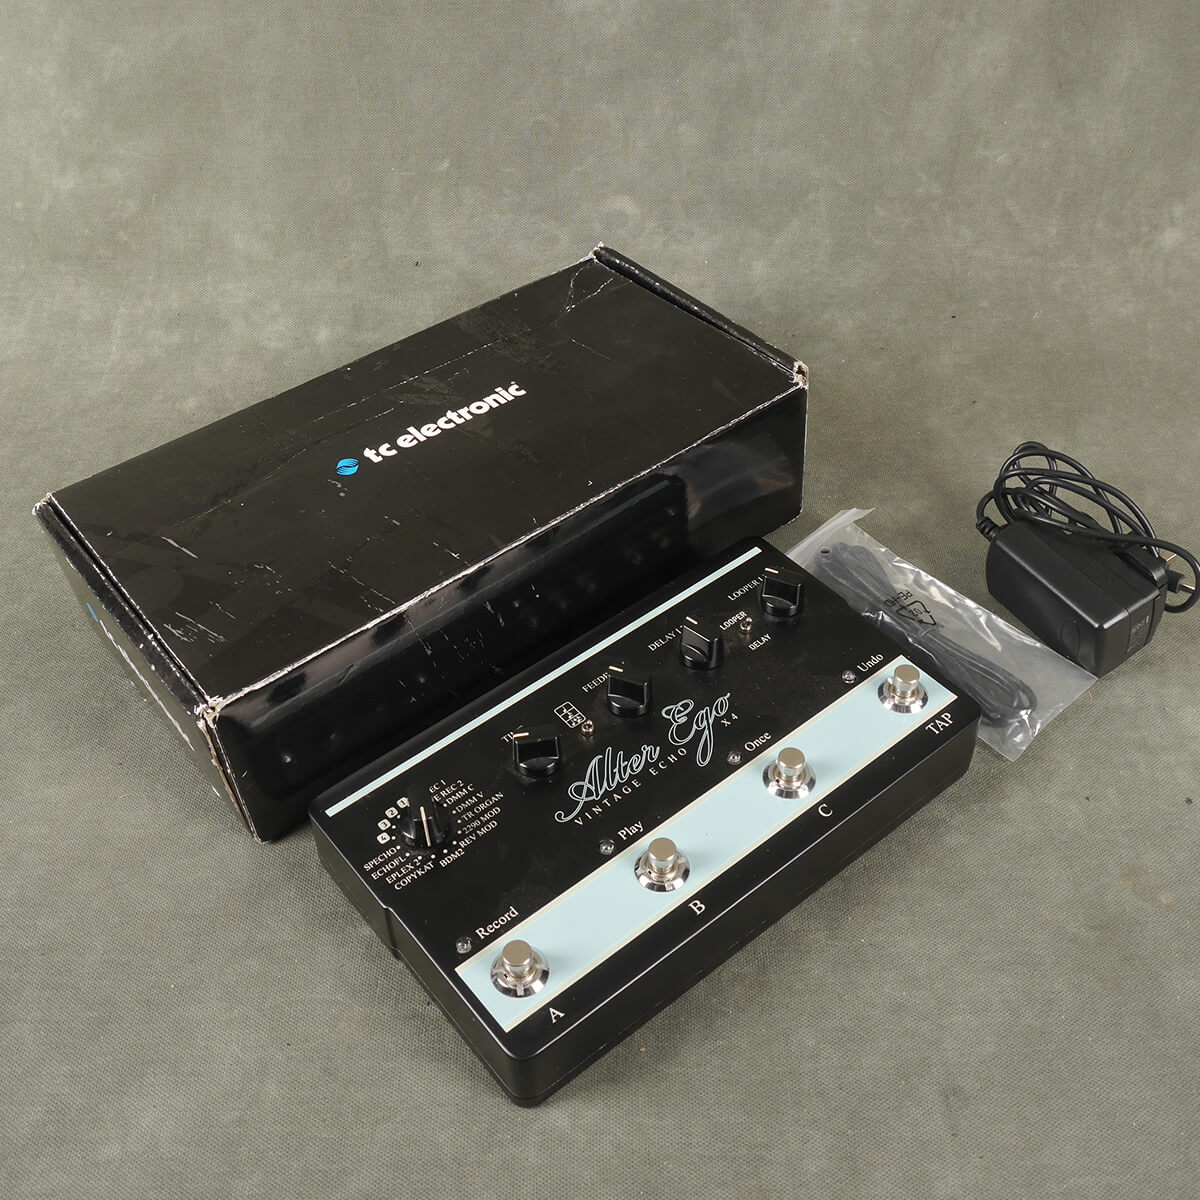 TC Electronic Alter Ego X4 Looper FX Pedal w/Box & PSU - 2nd Hand